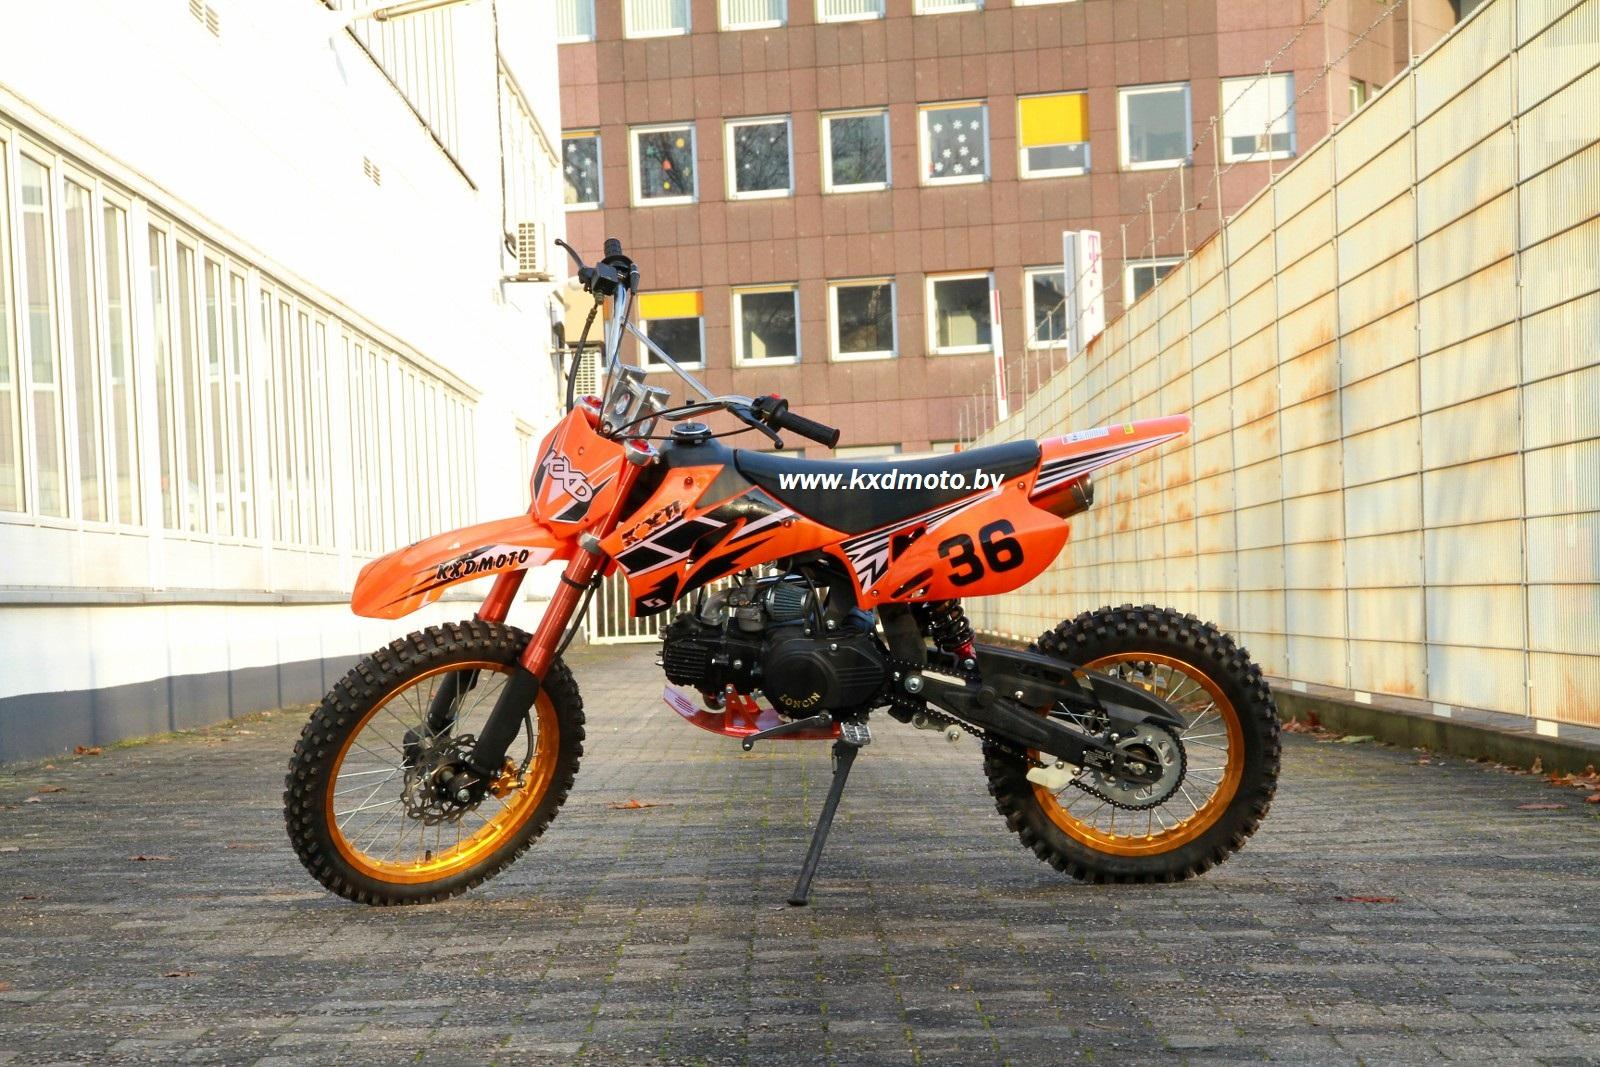 Кроссового Мотоцикла – Купить Кроссового Мотоцикла ...